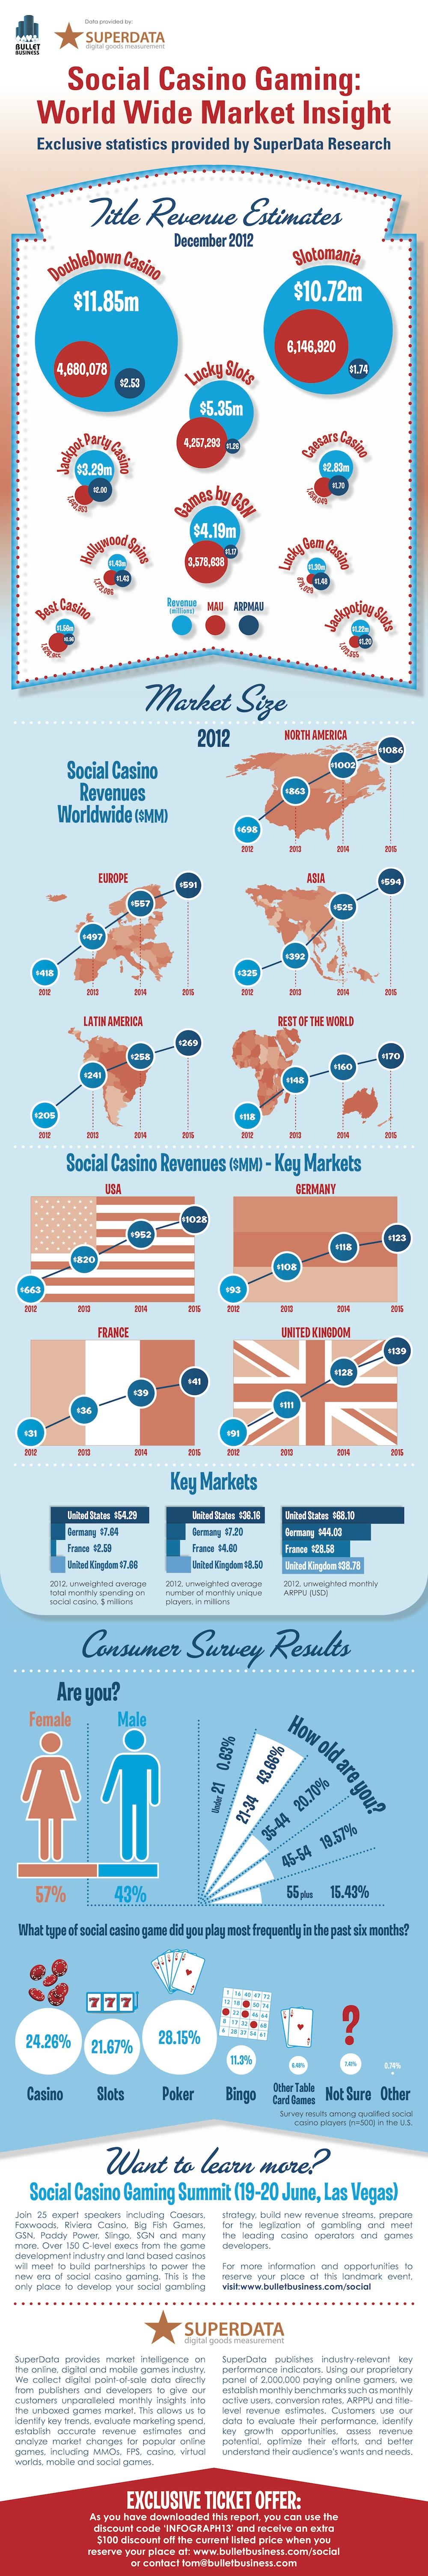 Social Casino Infographic, April 2013